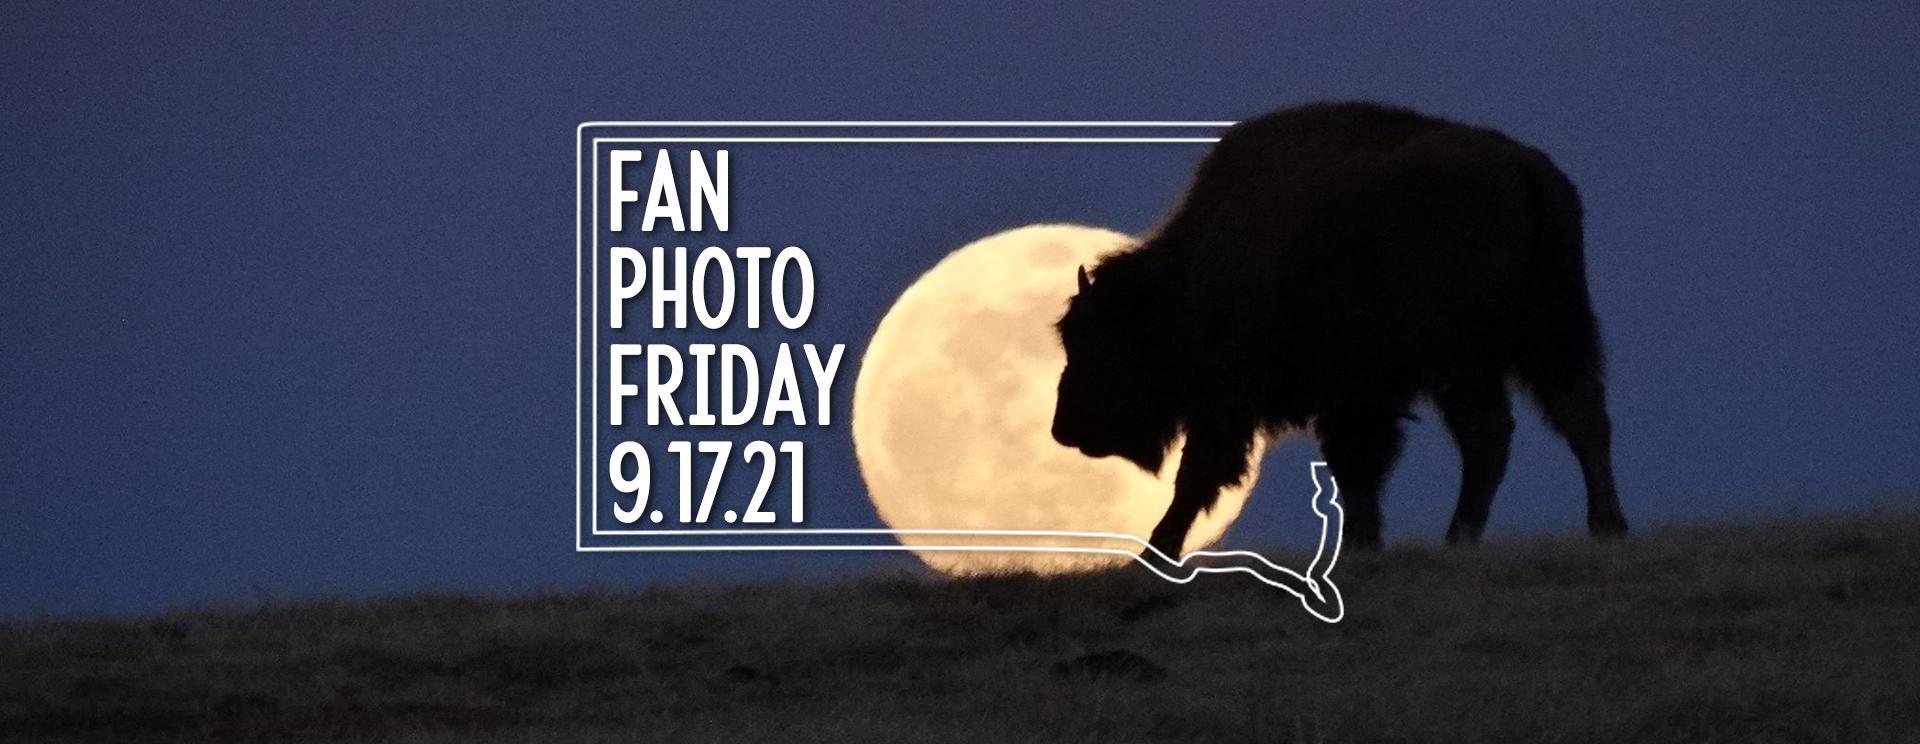 Fan Photo Friday   Sept. 17, 2021